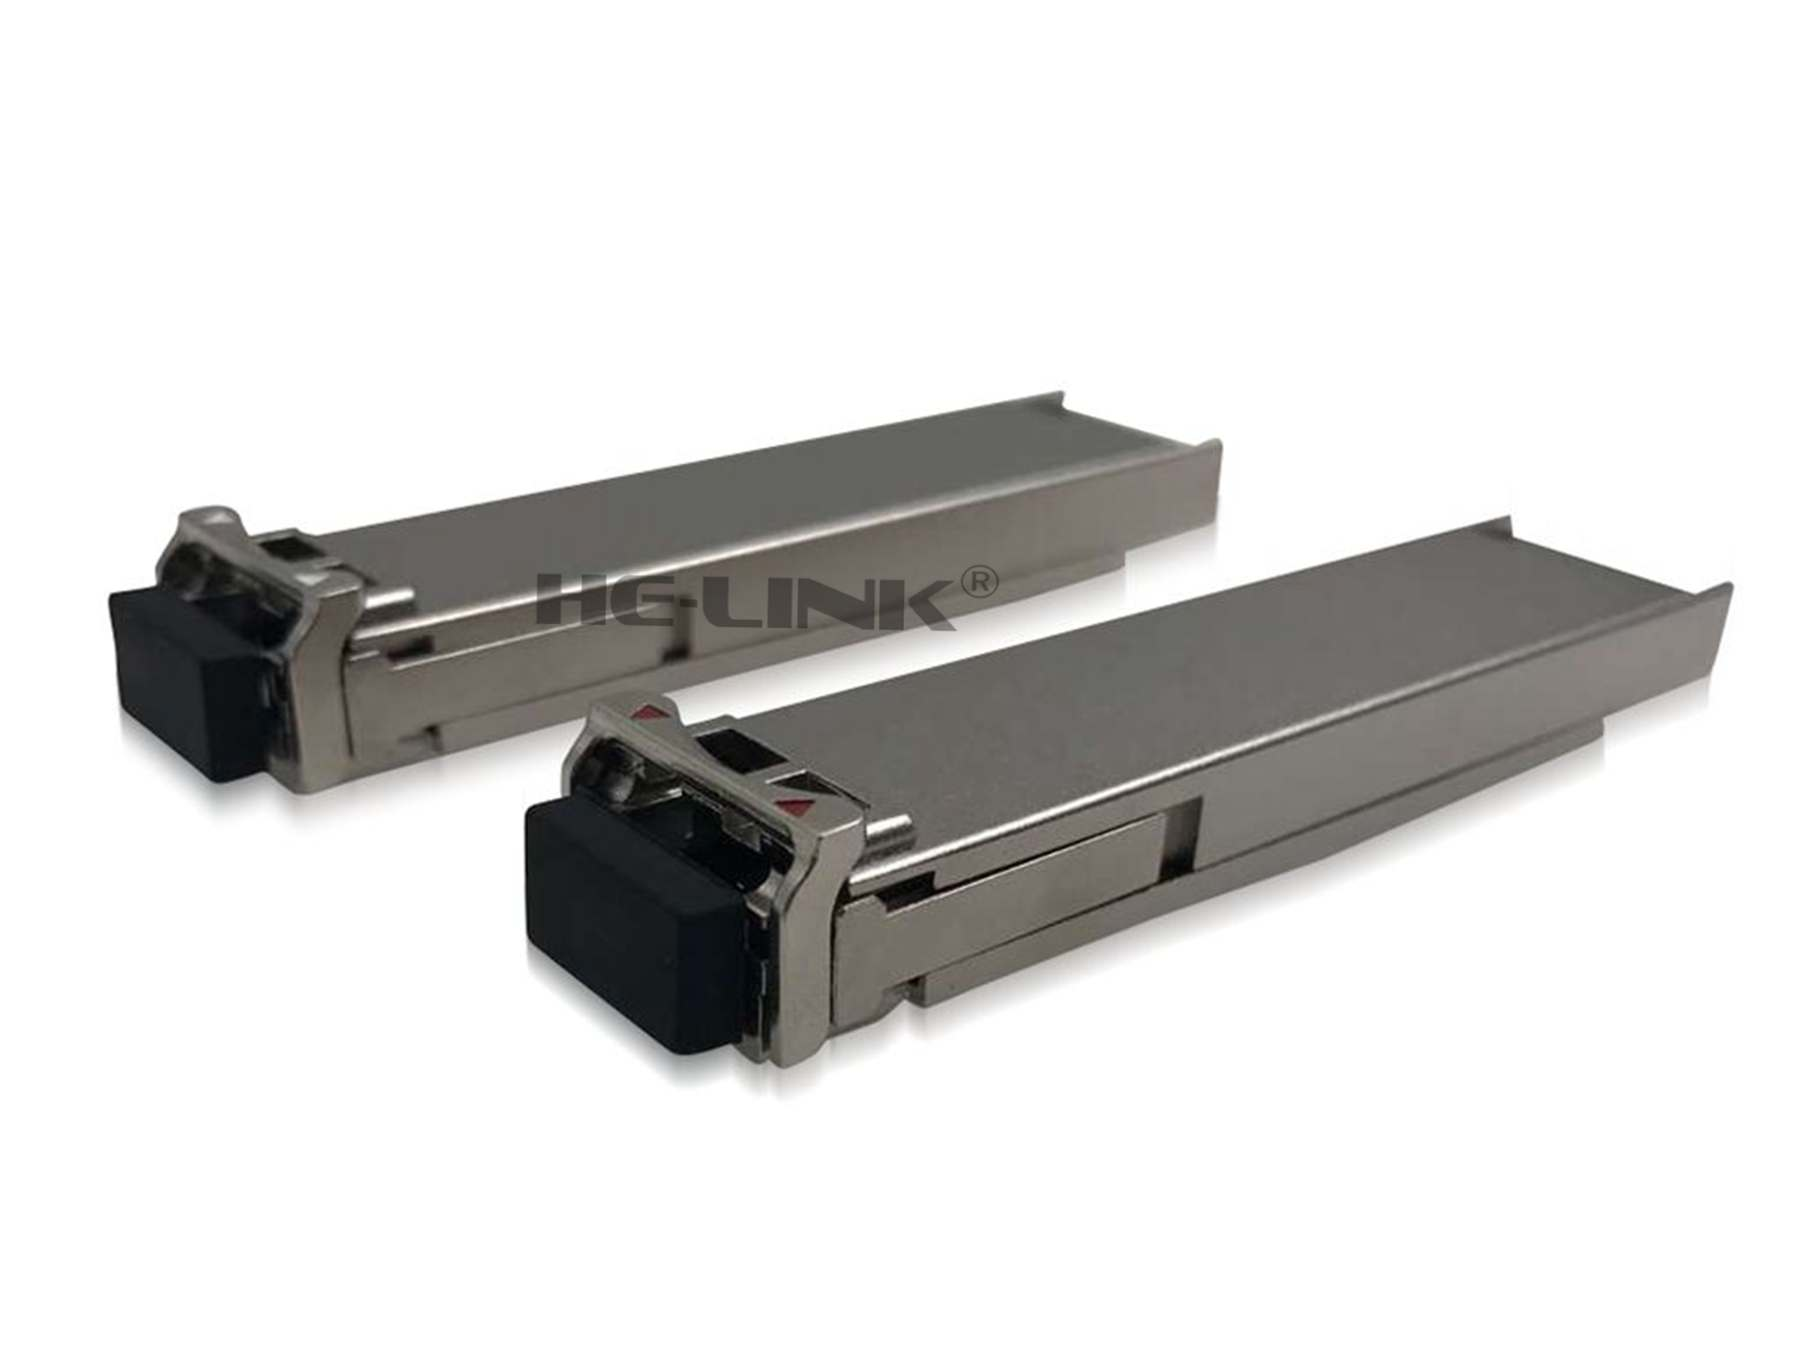 LODFIBER EX-XFP-10GE-BX23-40/EX-XFP-10GE-BX32-40 Ju-ni-per Net-works Compatible Pair of BiDi XFP 10G 40km TransceiverLODFIBER EX-XFP-10GE-BX23-40/EX-XFP-10GE-BX32-40 Ju-ni-per Net-works Compatible Pair of BiDi XFP 10G 40km Transceiver